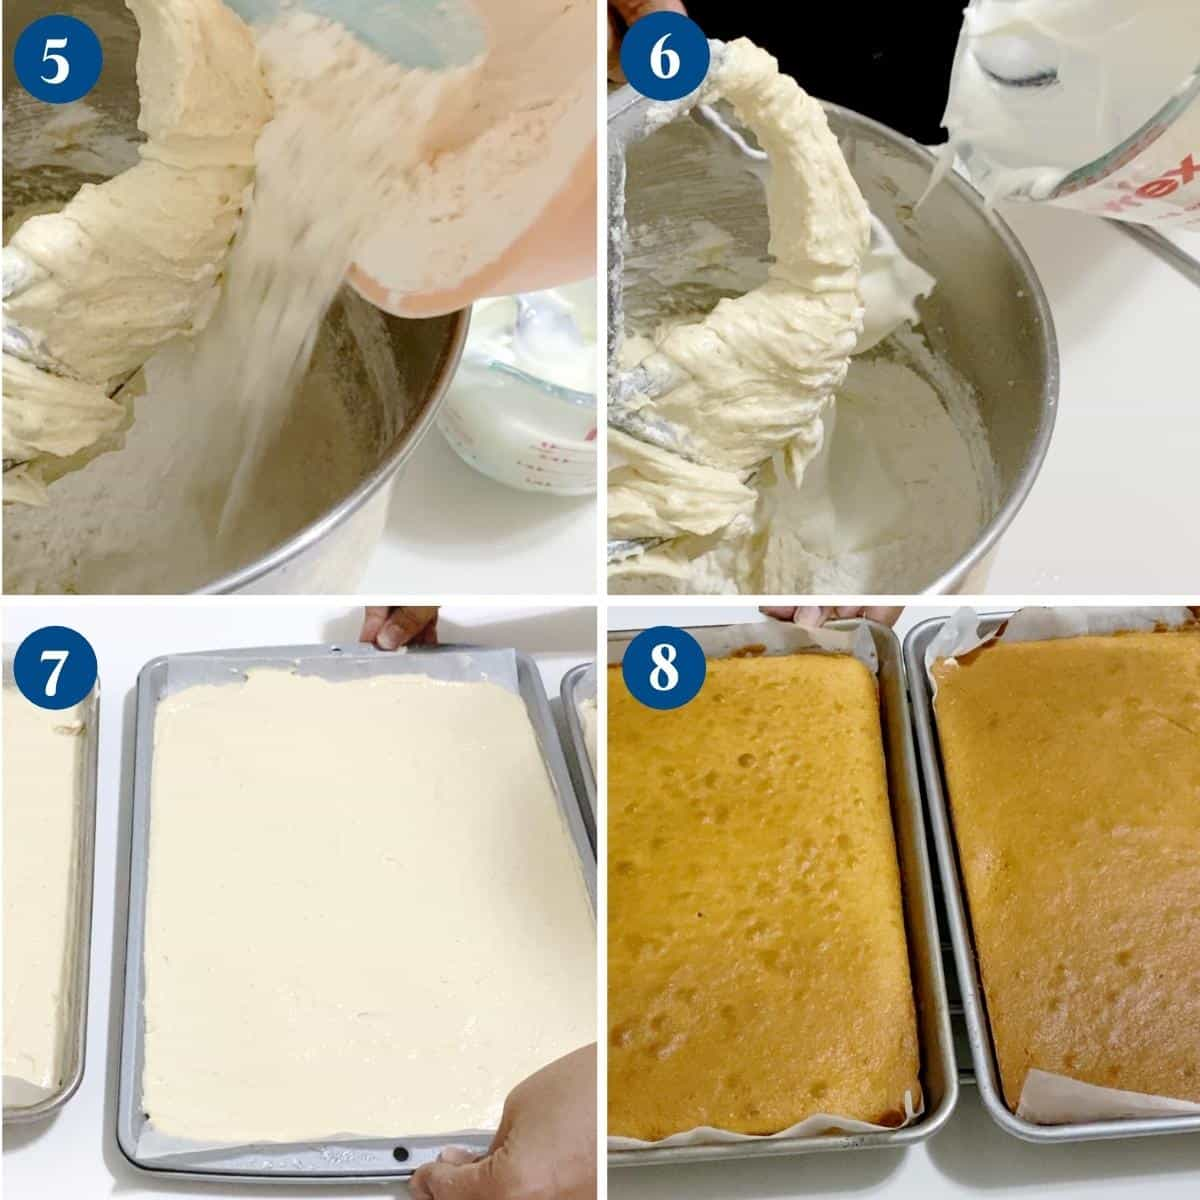 Progress pictures collage making cake batter.